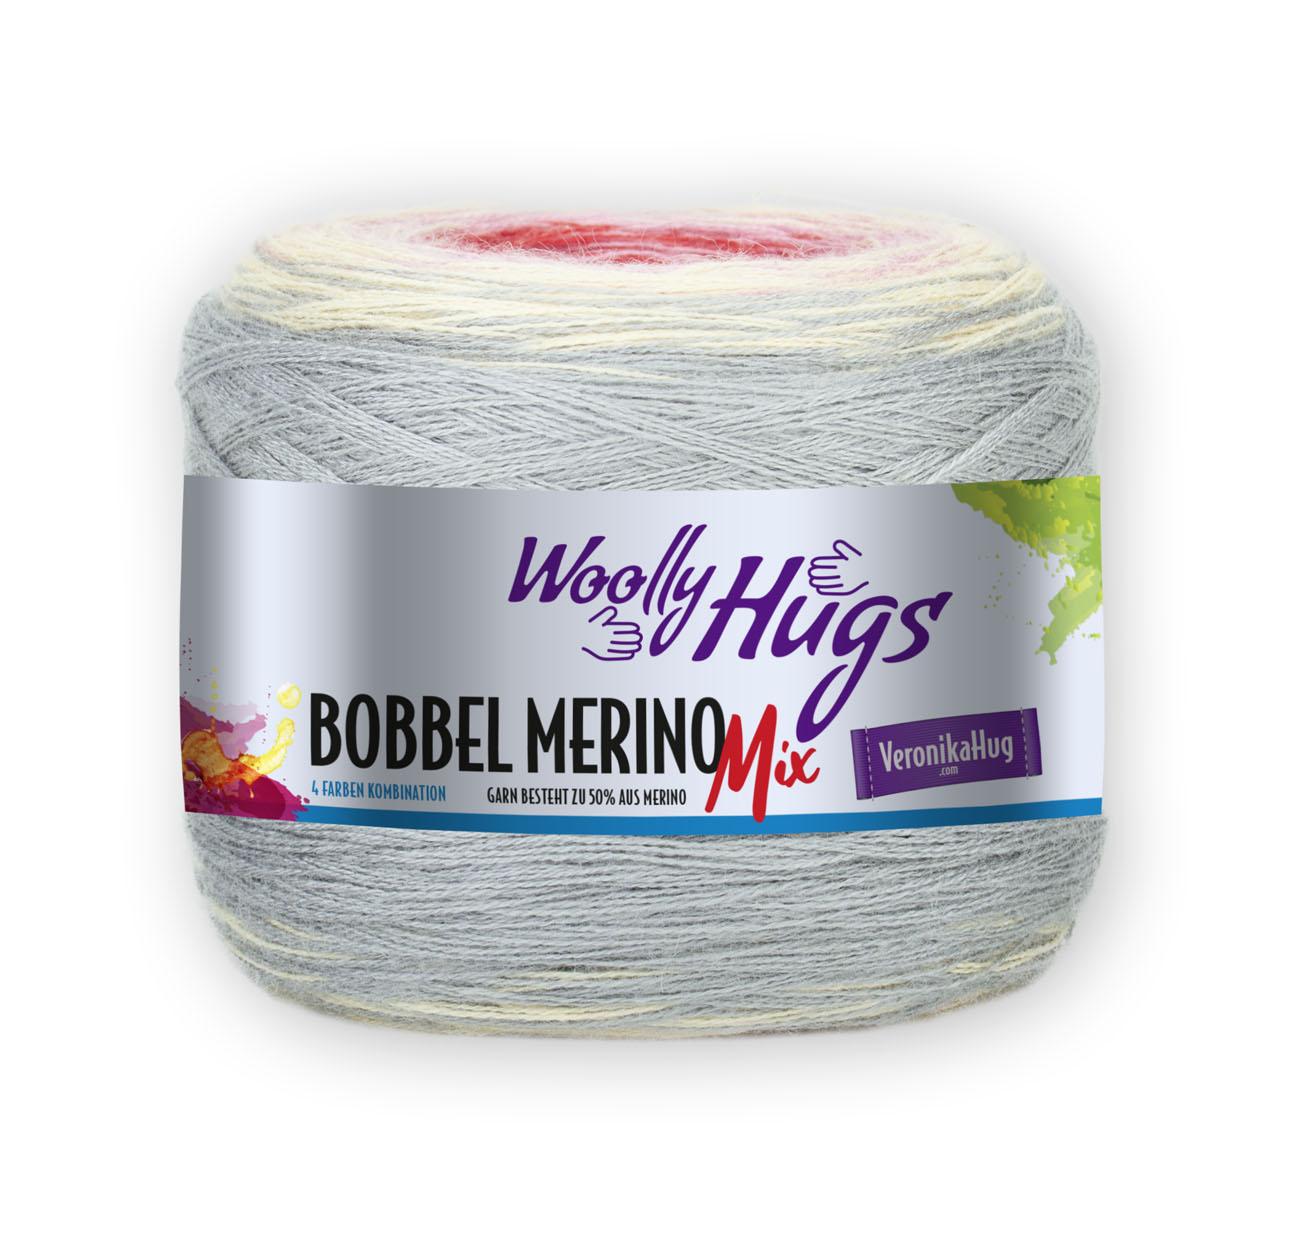 Woolly Hugs Bobbel Merinomix 705